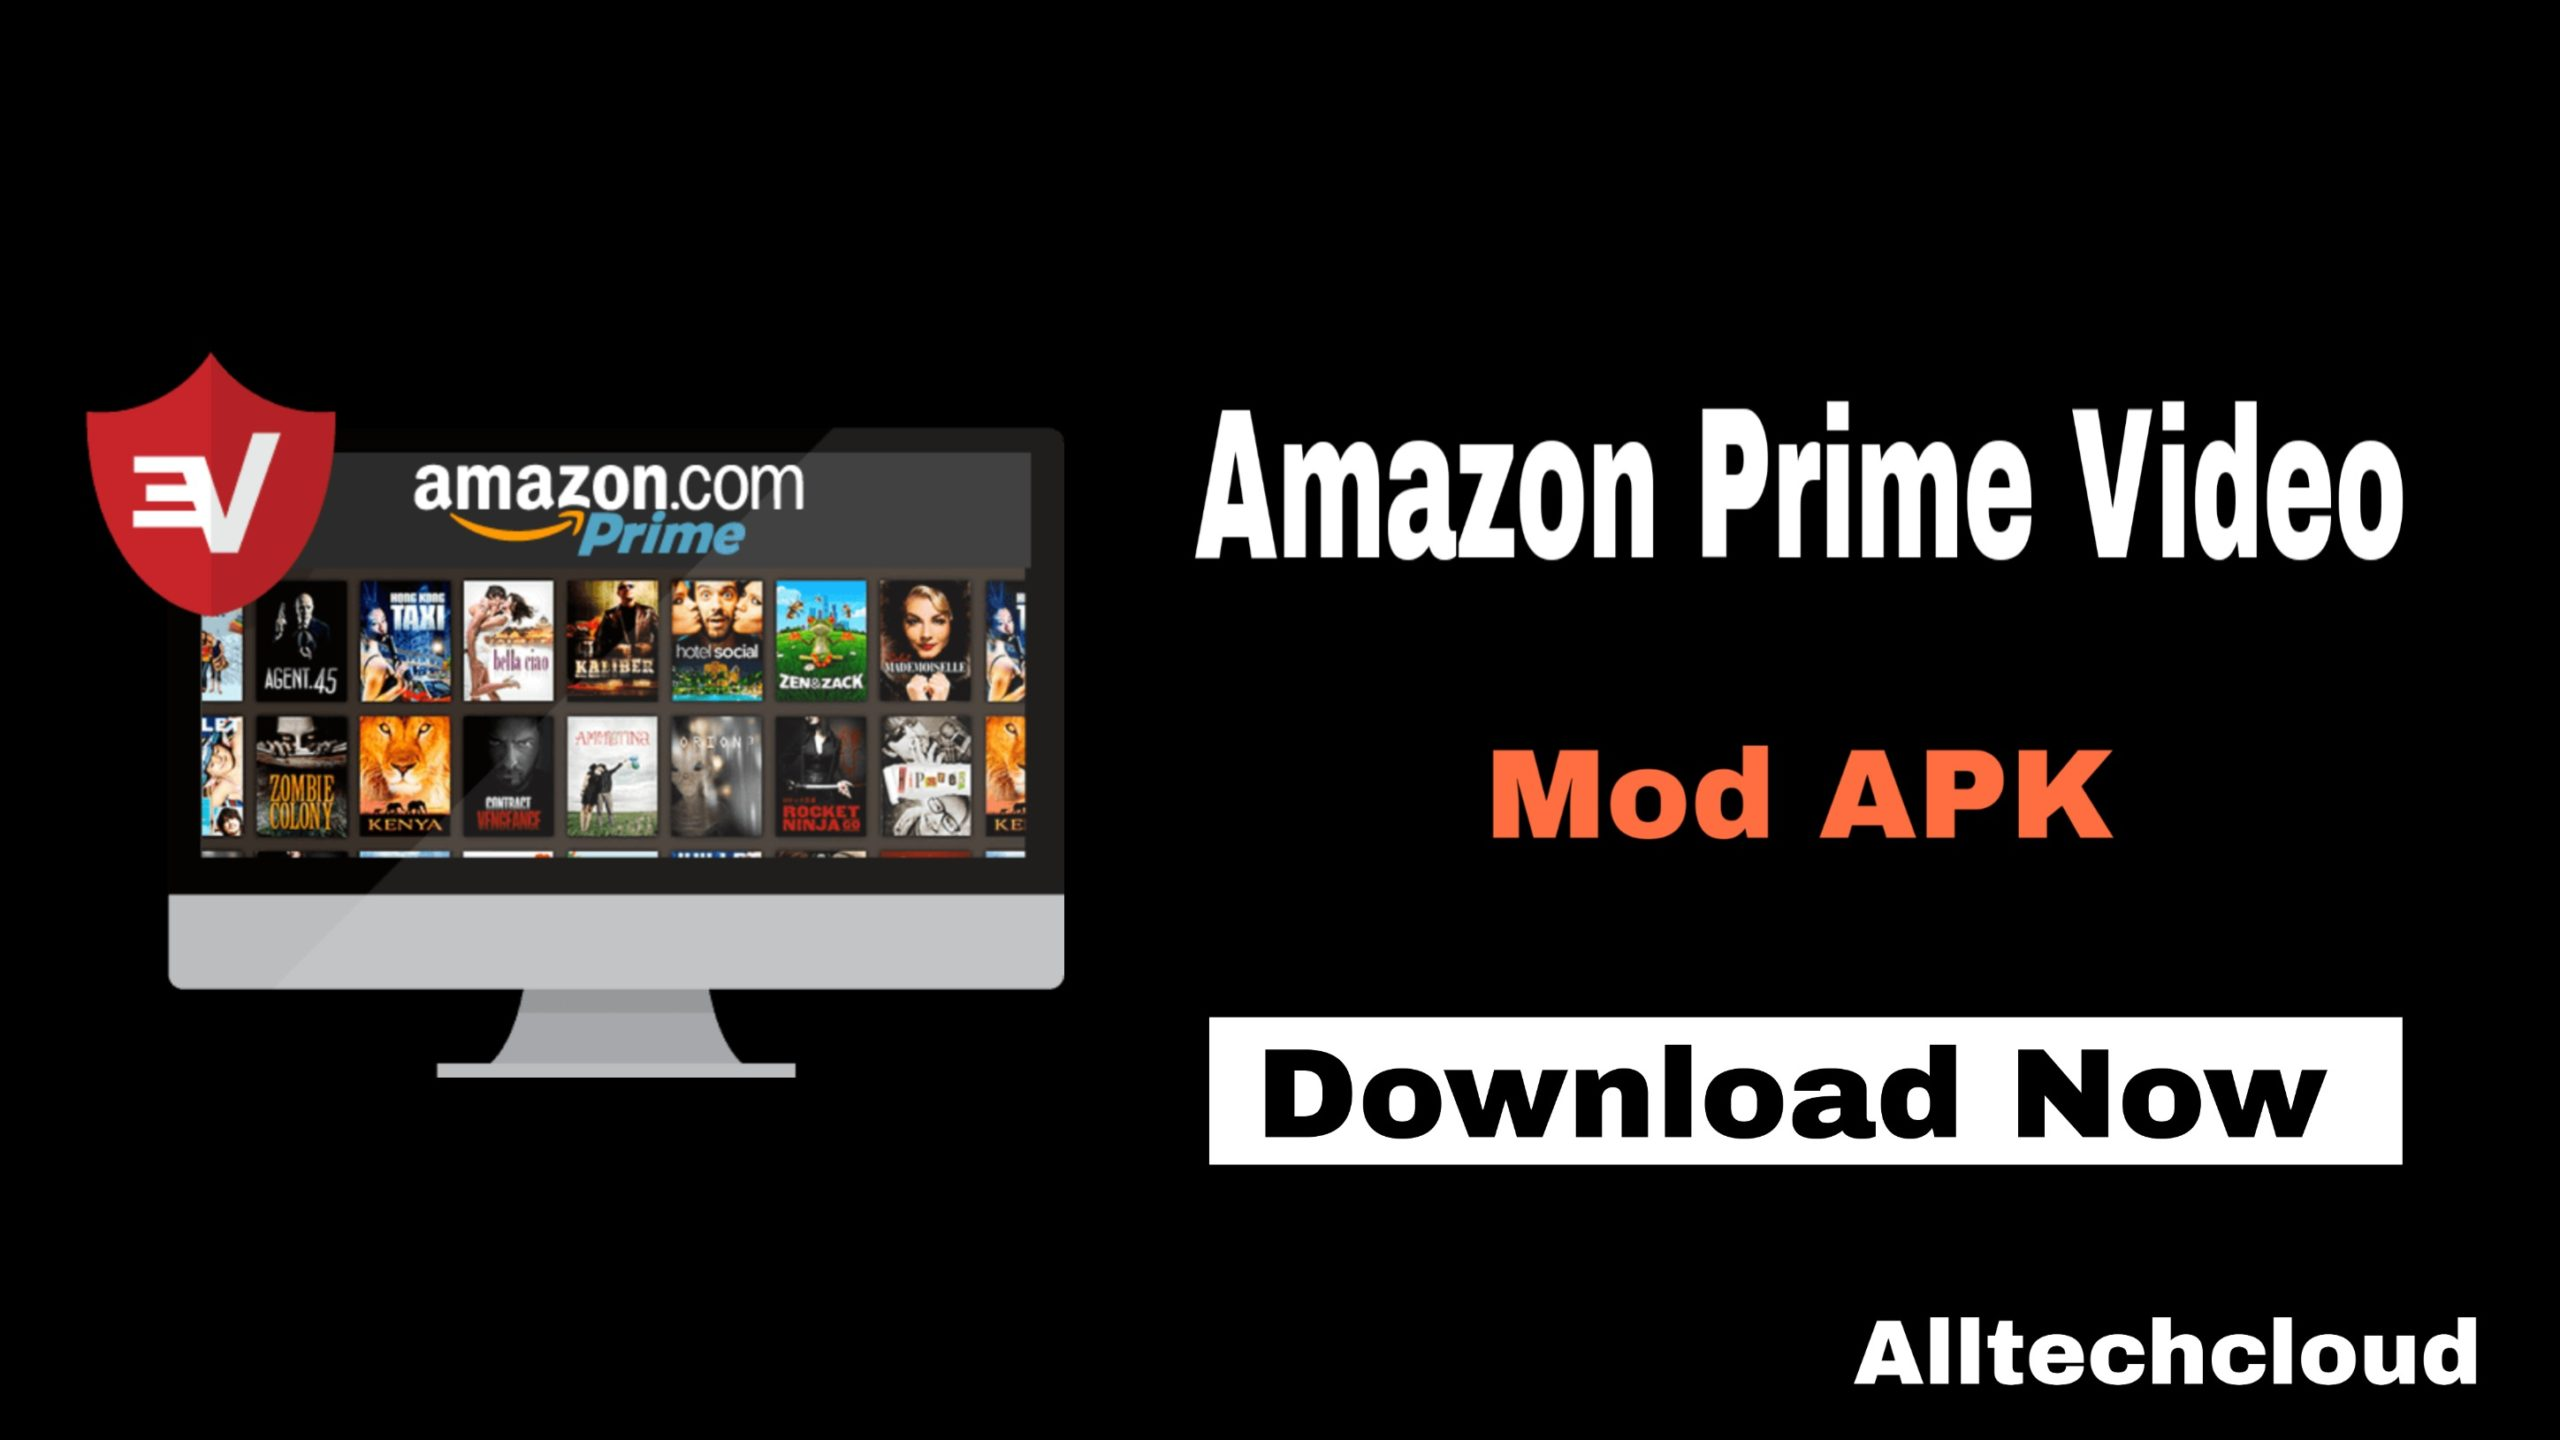 Amazon Prime Video MOD APK v3.0.294.10147 [Ads Free] 2021